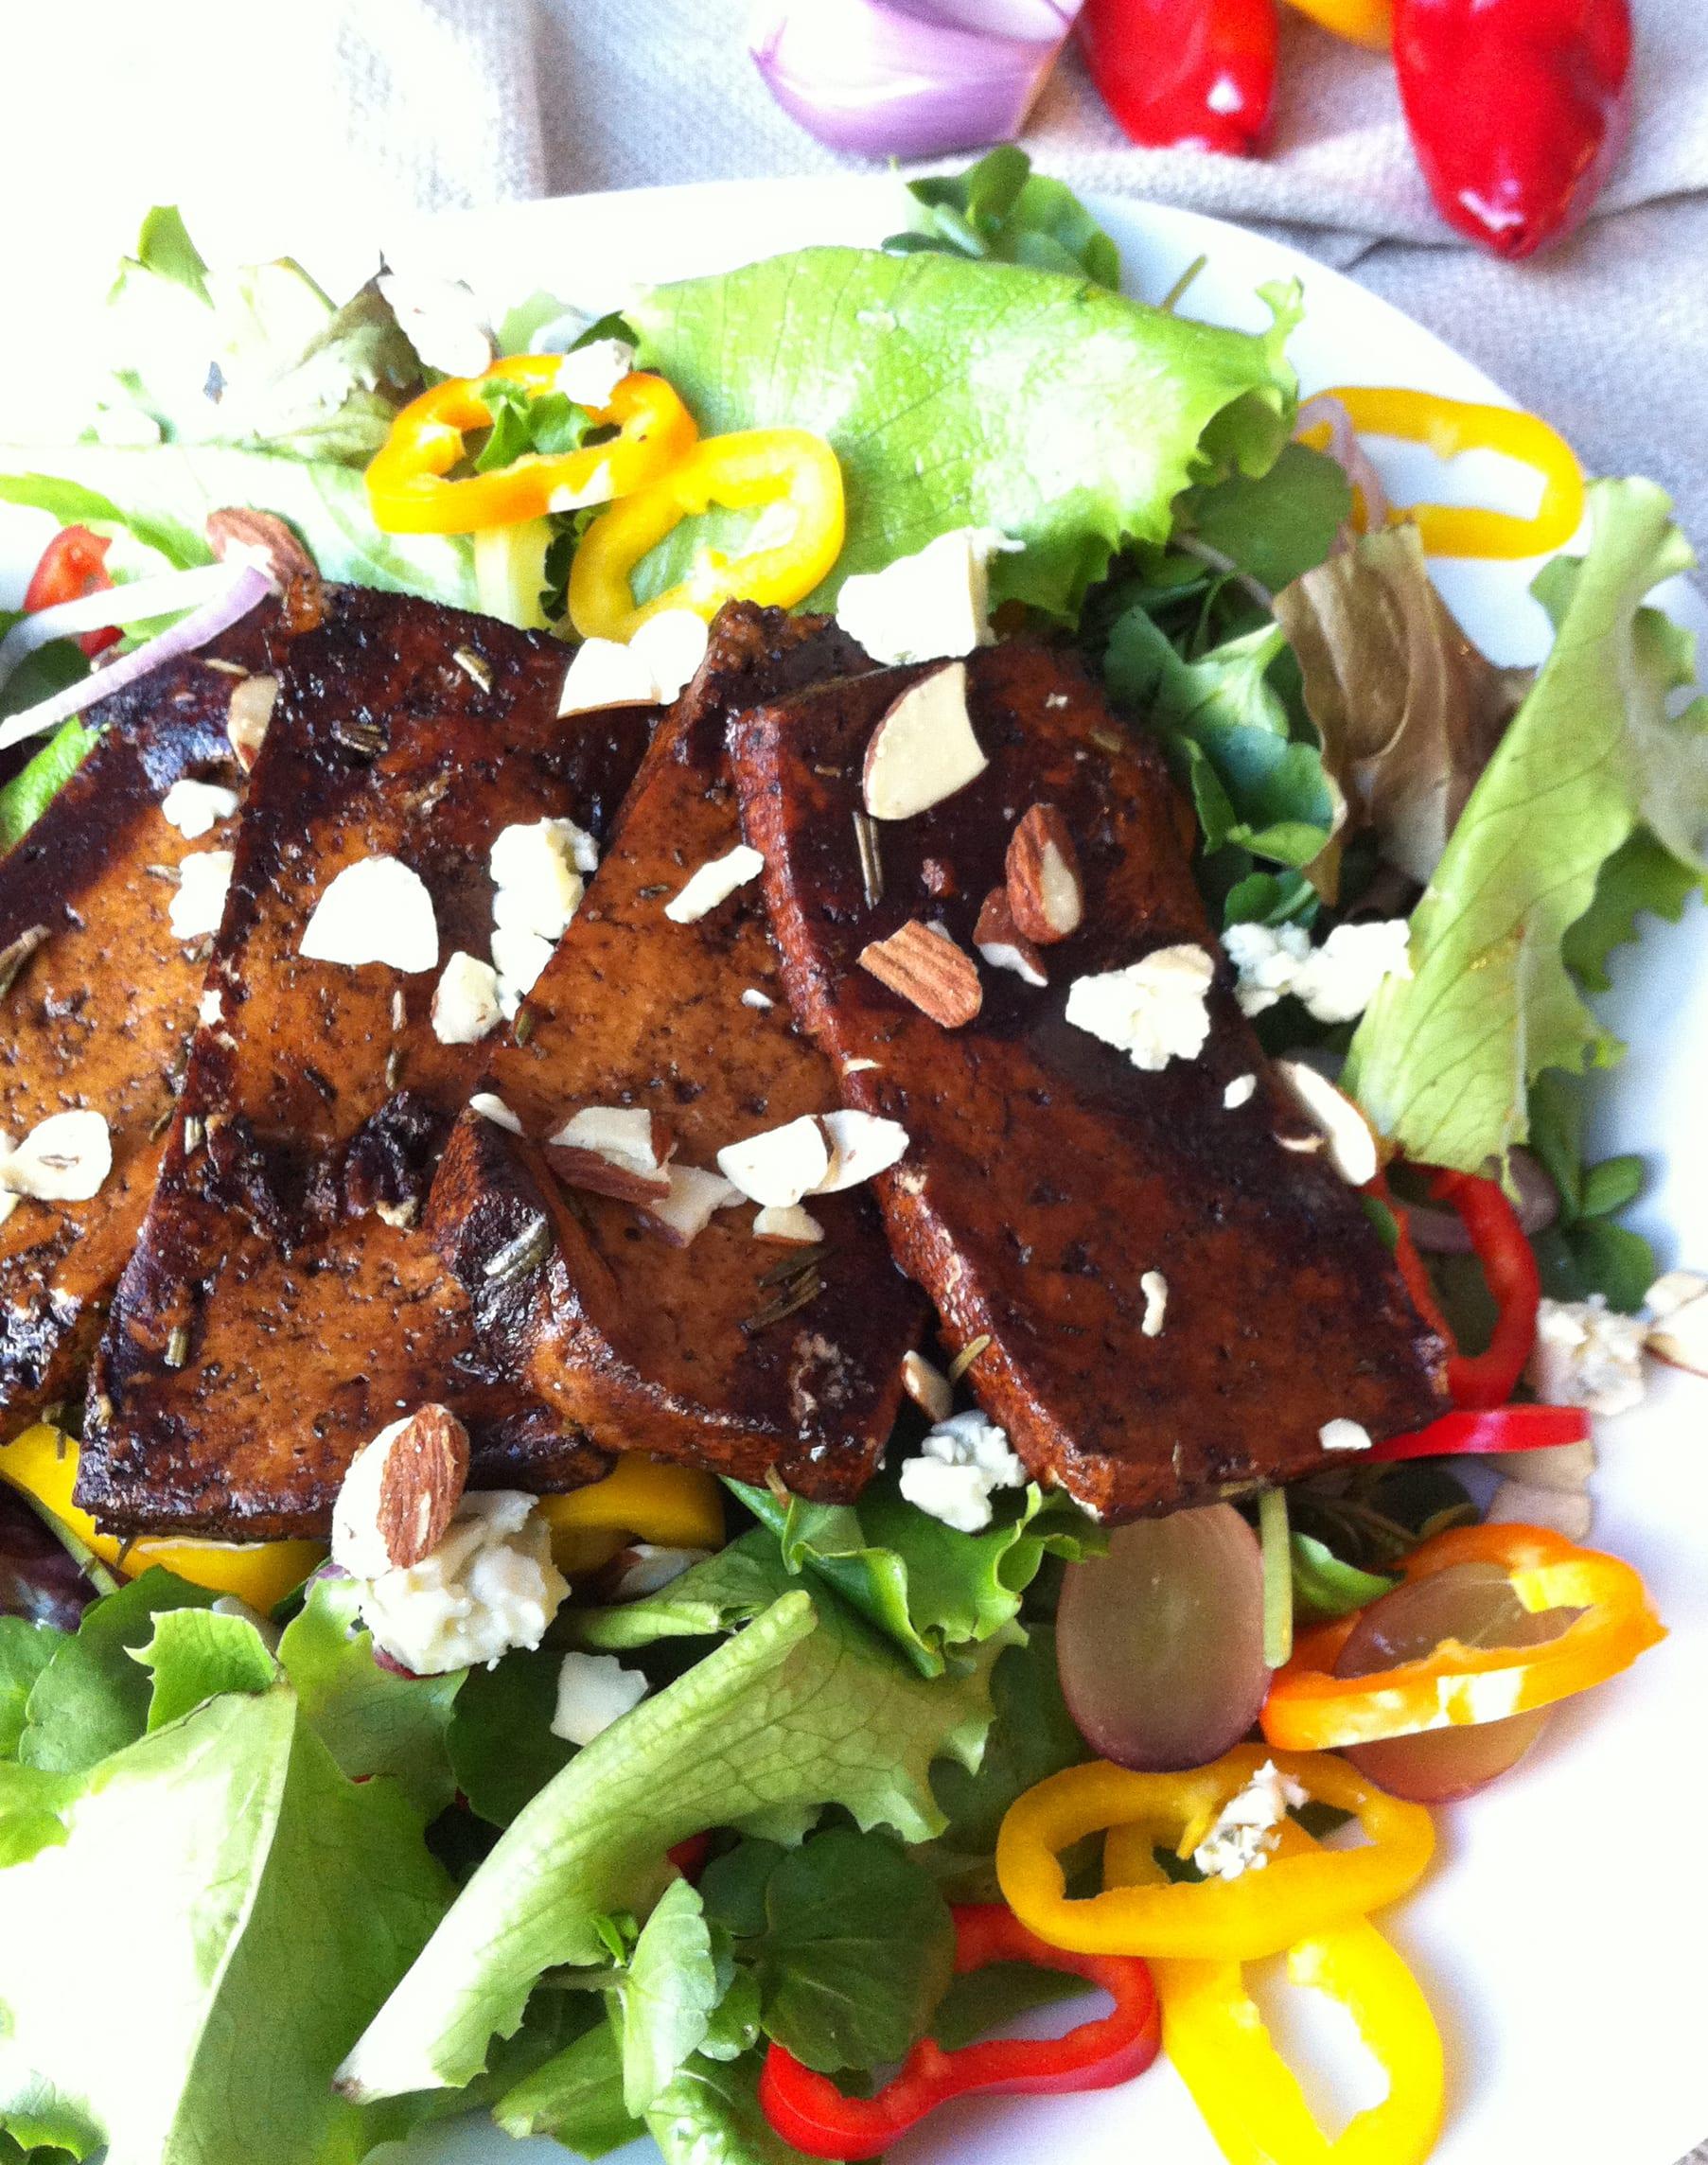 Marinated Tofu Salad with Sweet Balsamic Glaze